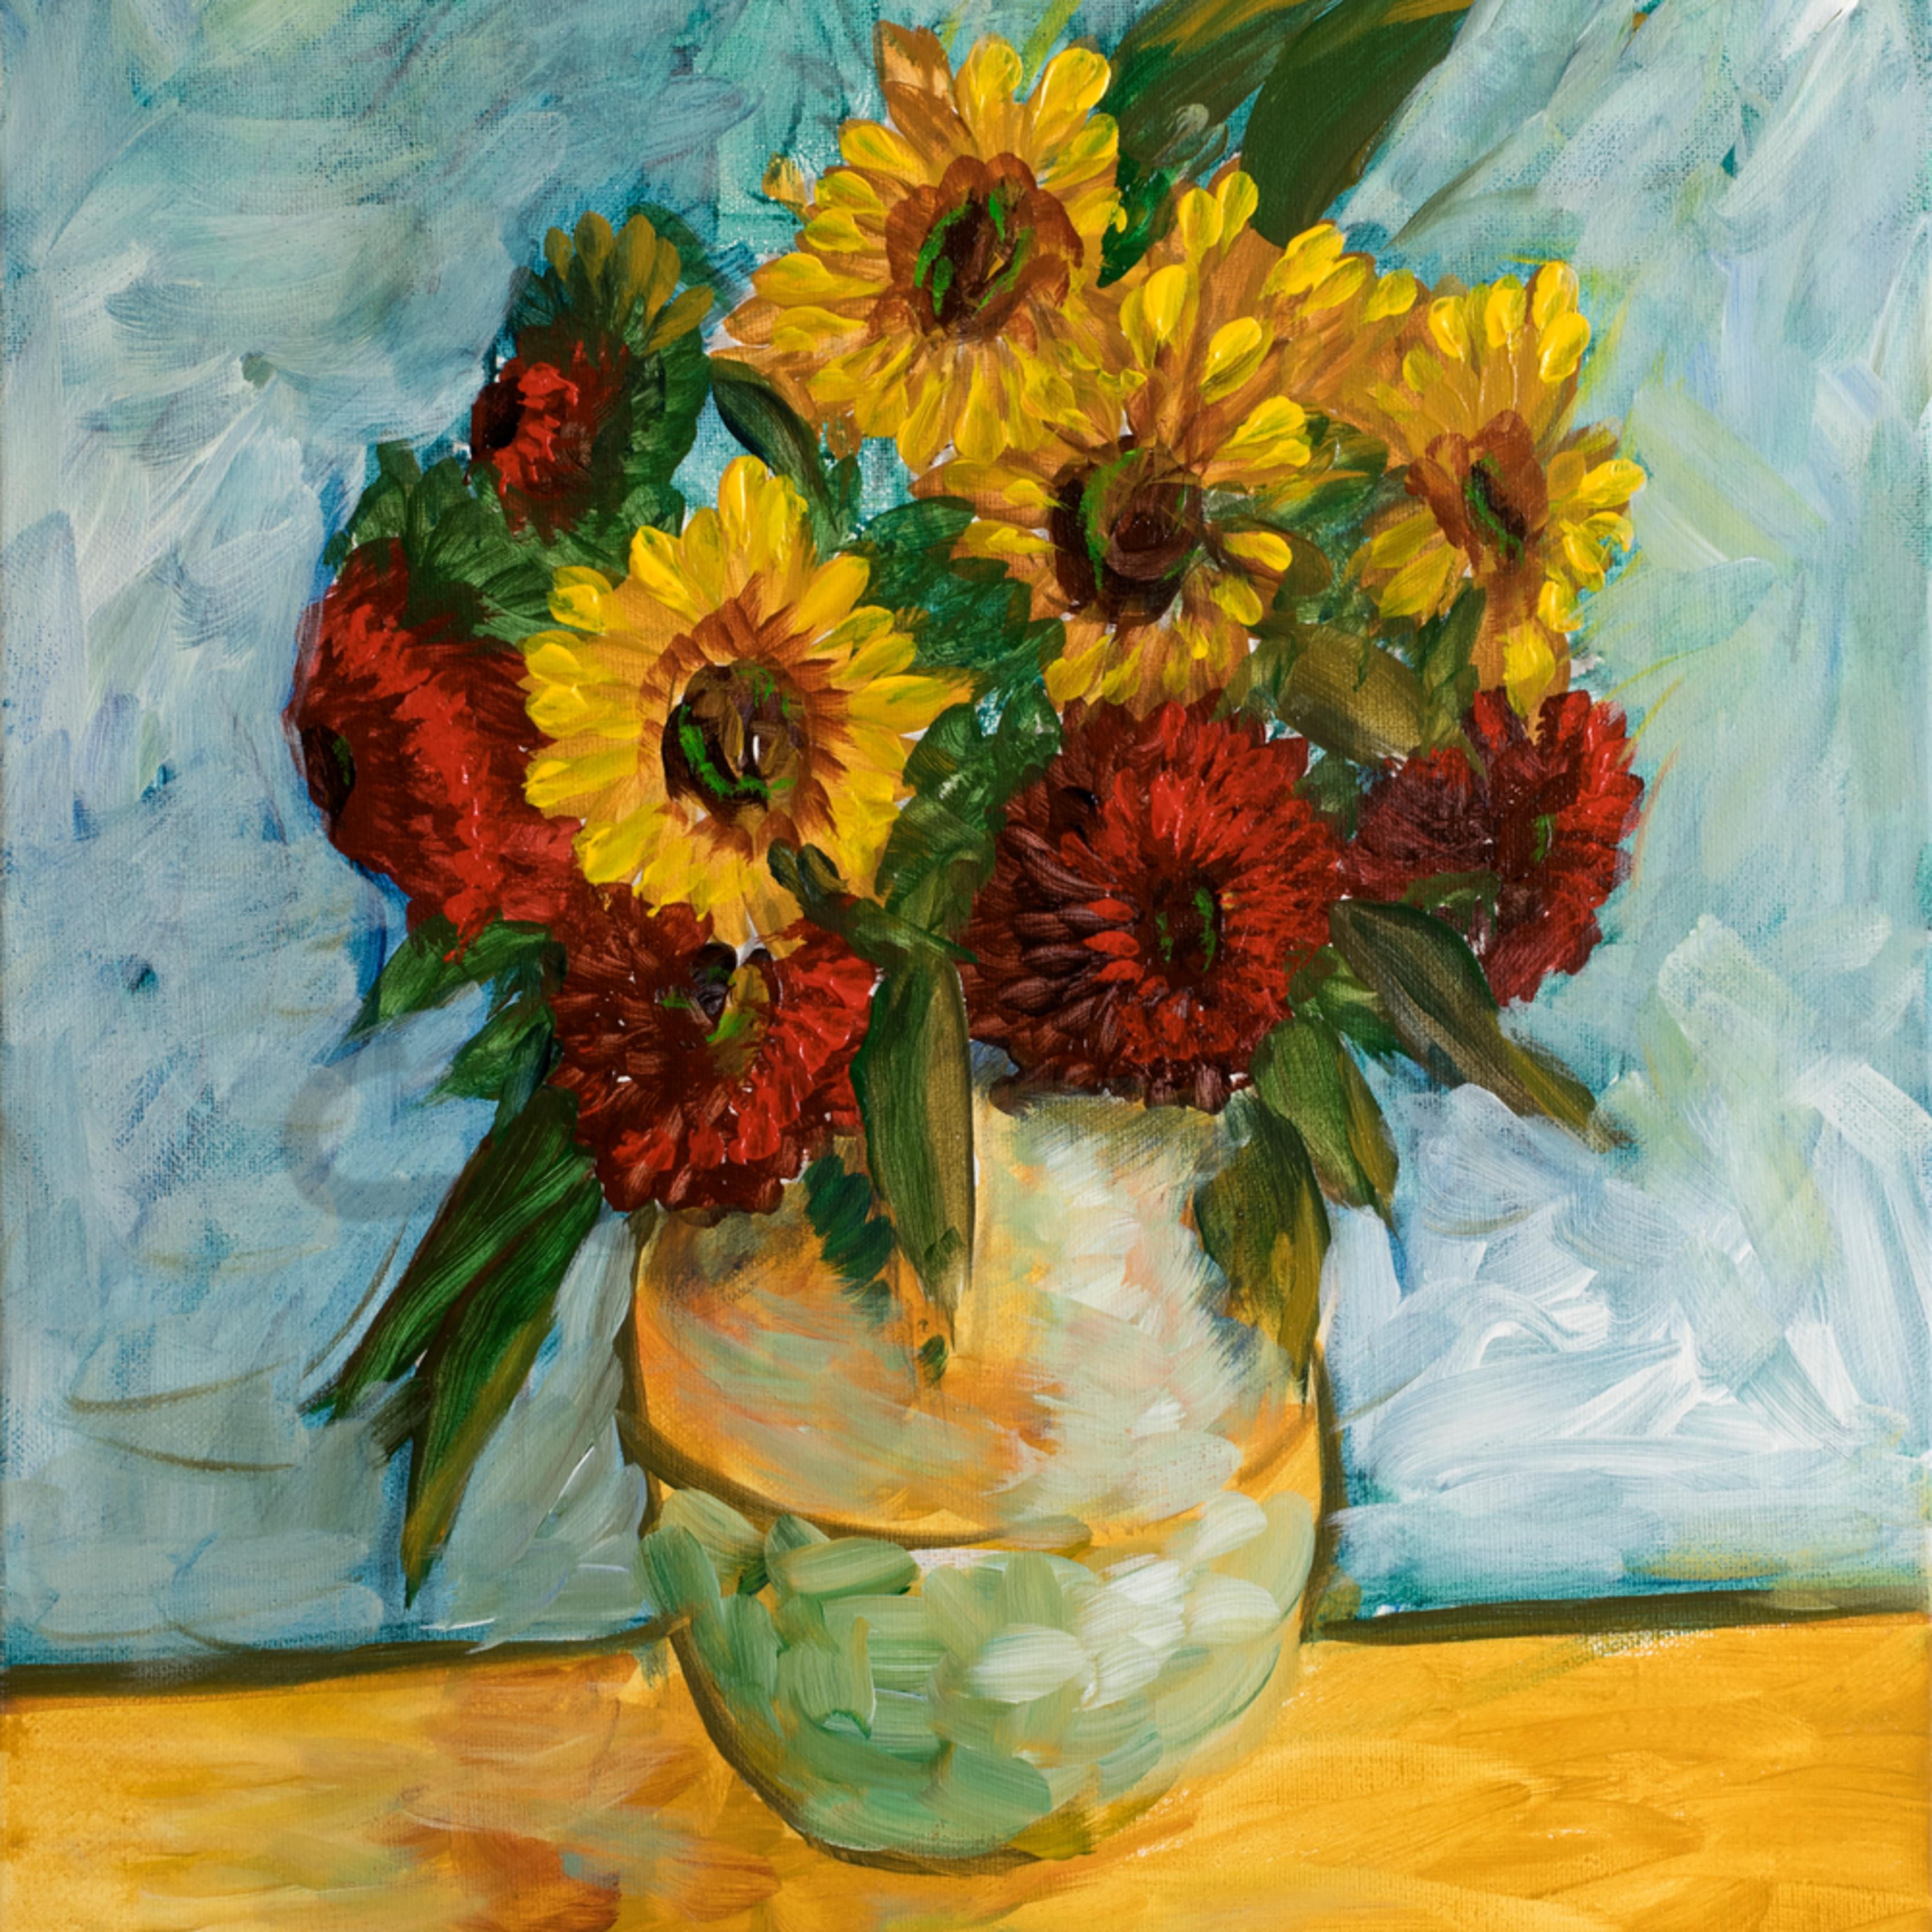 Flowers in jar loybjy